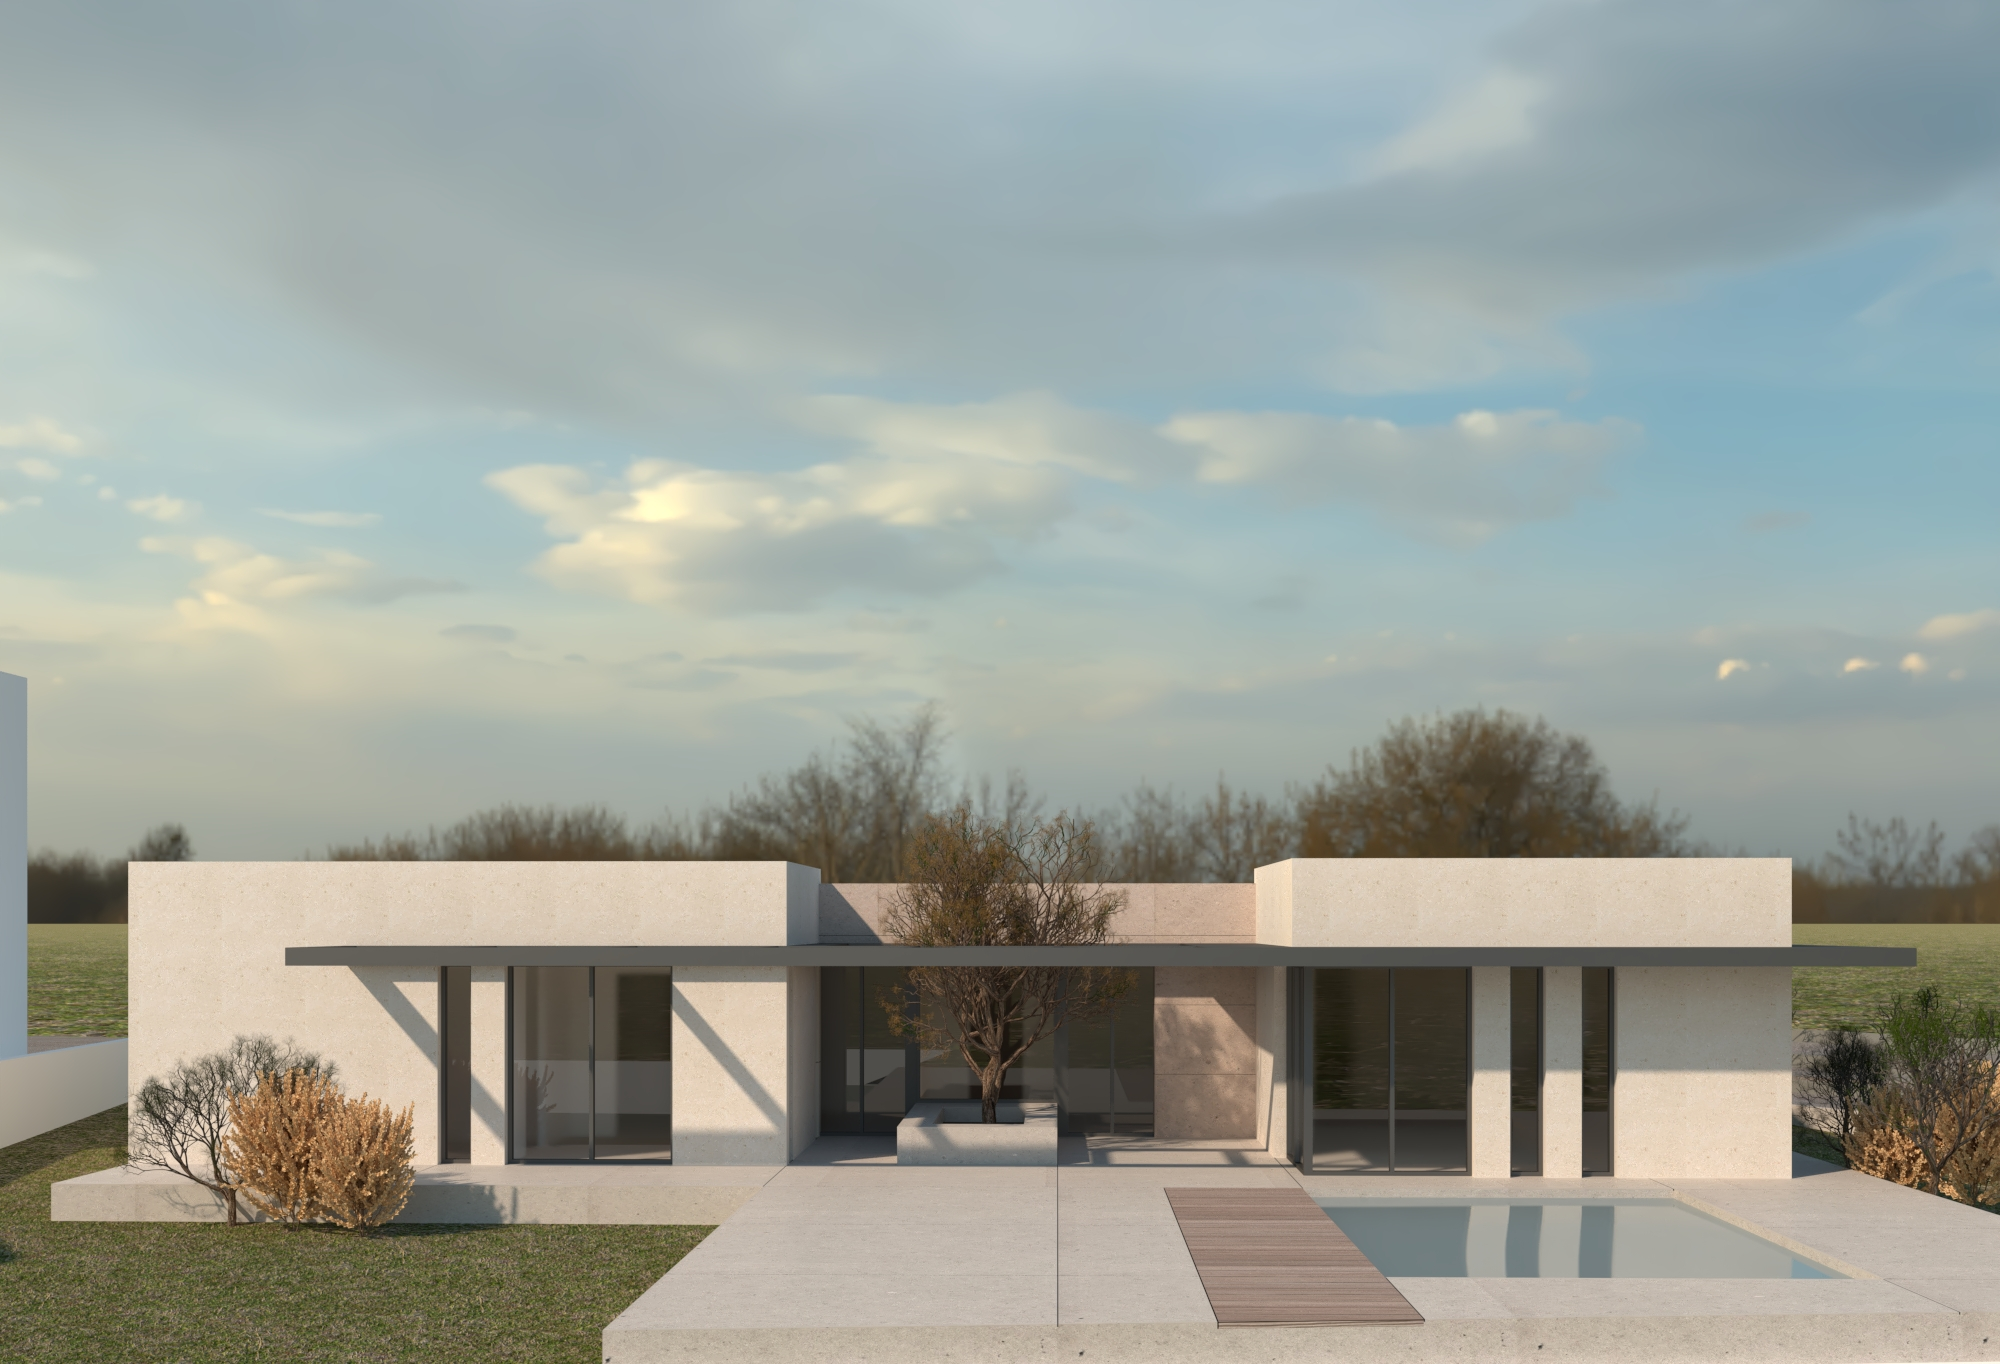 Residence, Nea Mesimvria, 2020